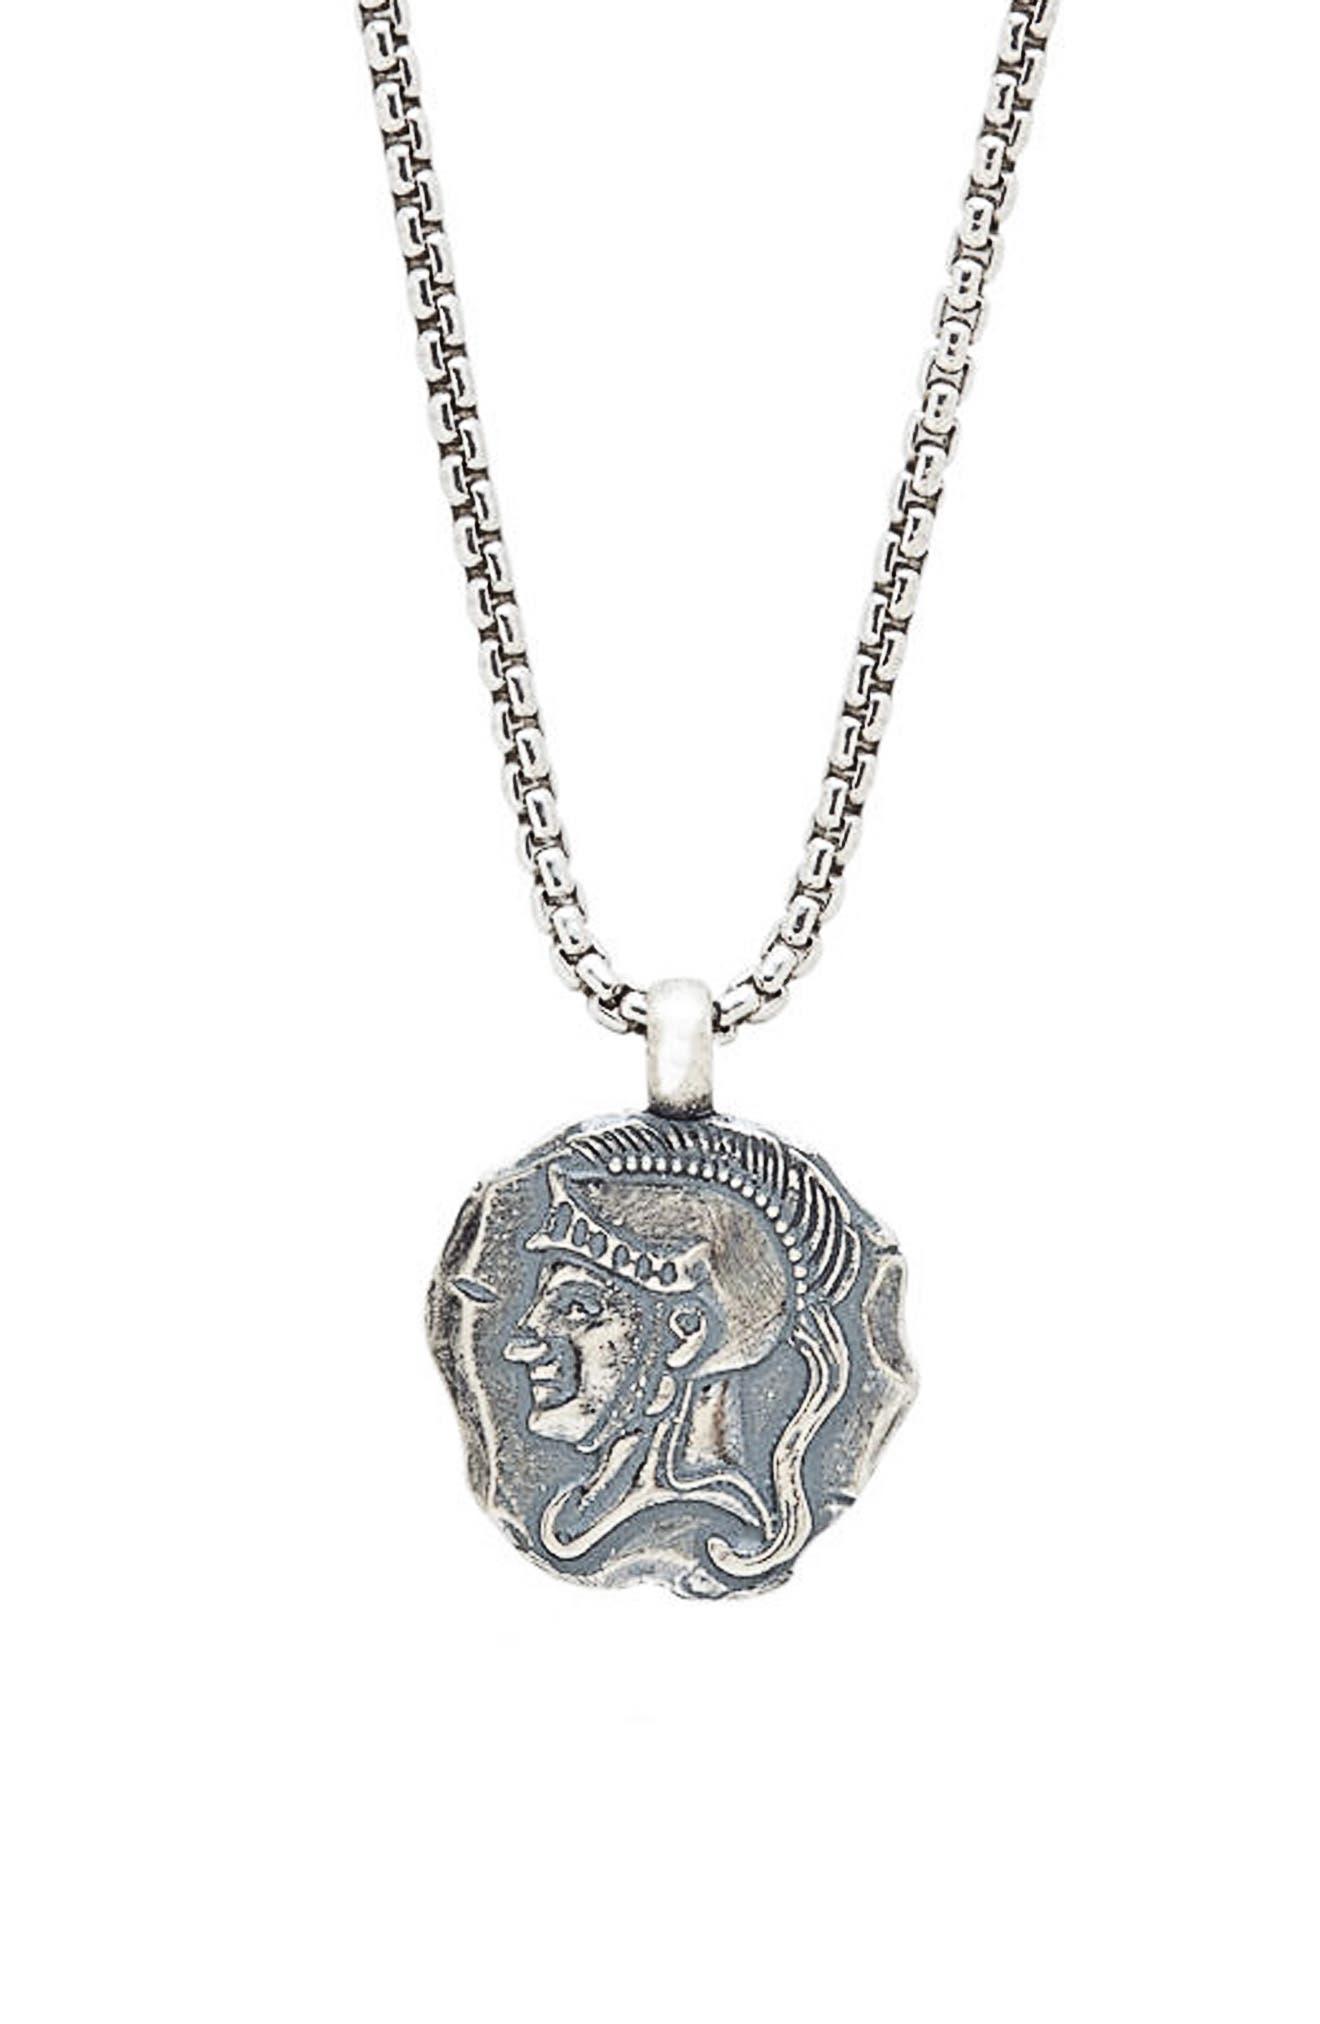 Main Image - Degs & Sal Spartan Pendant Necklace